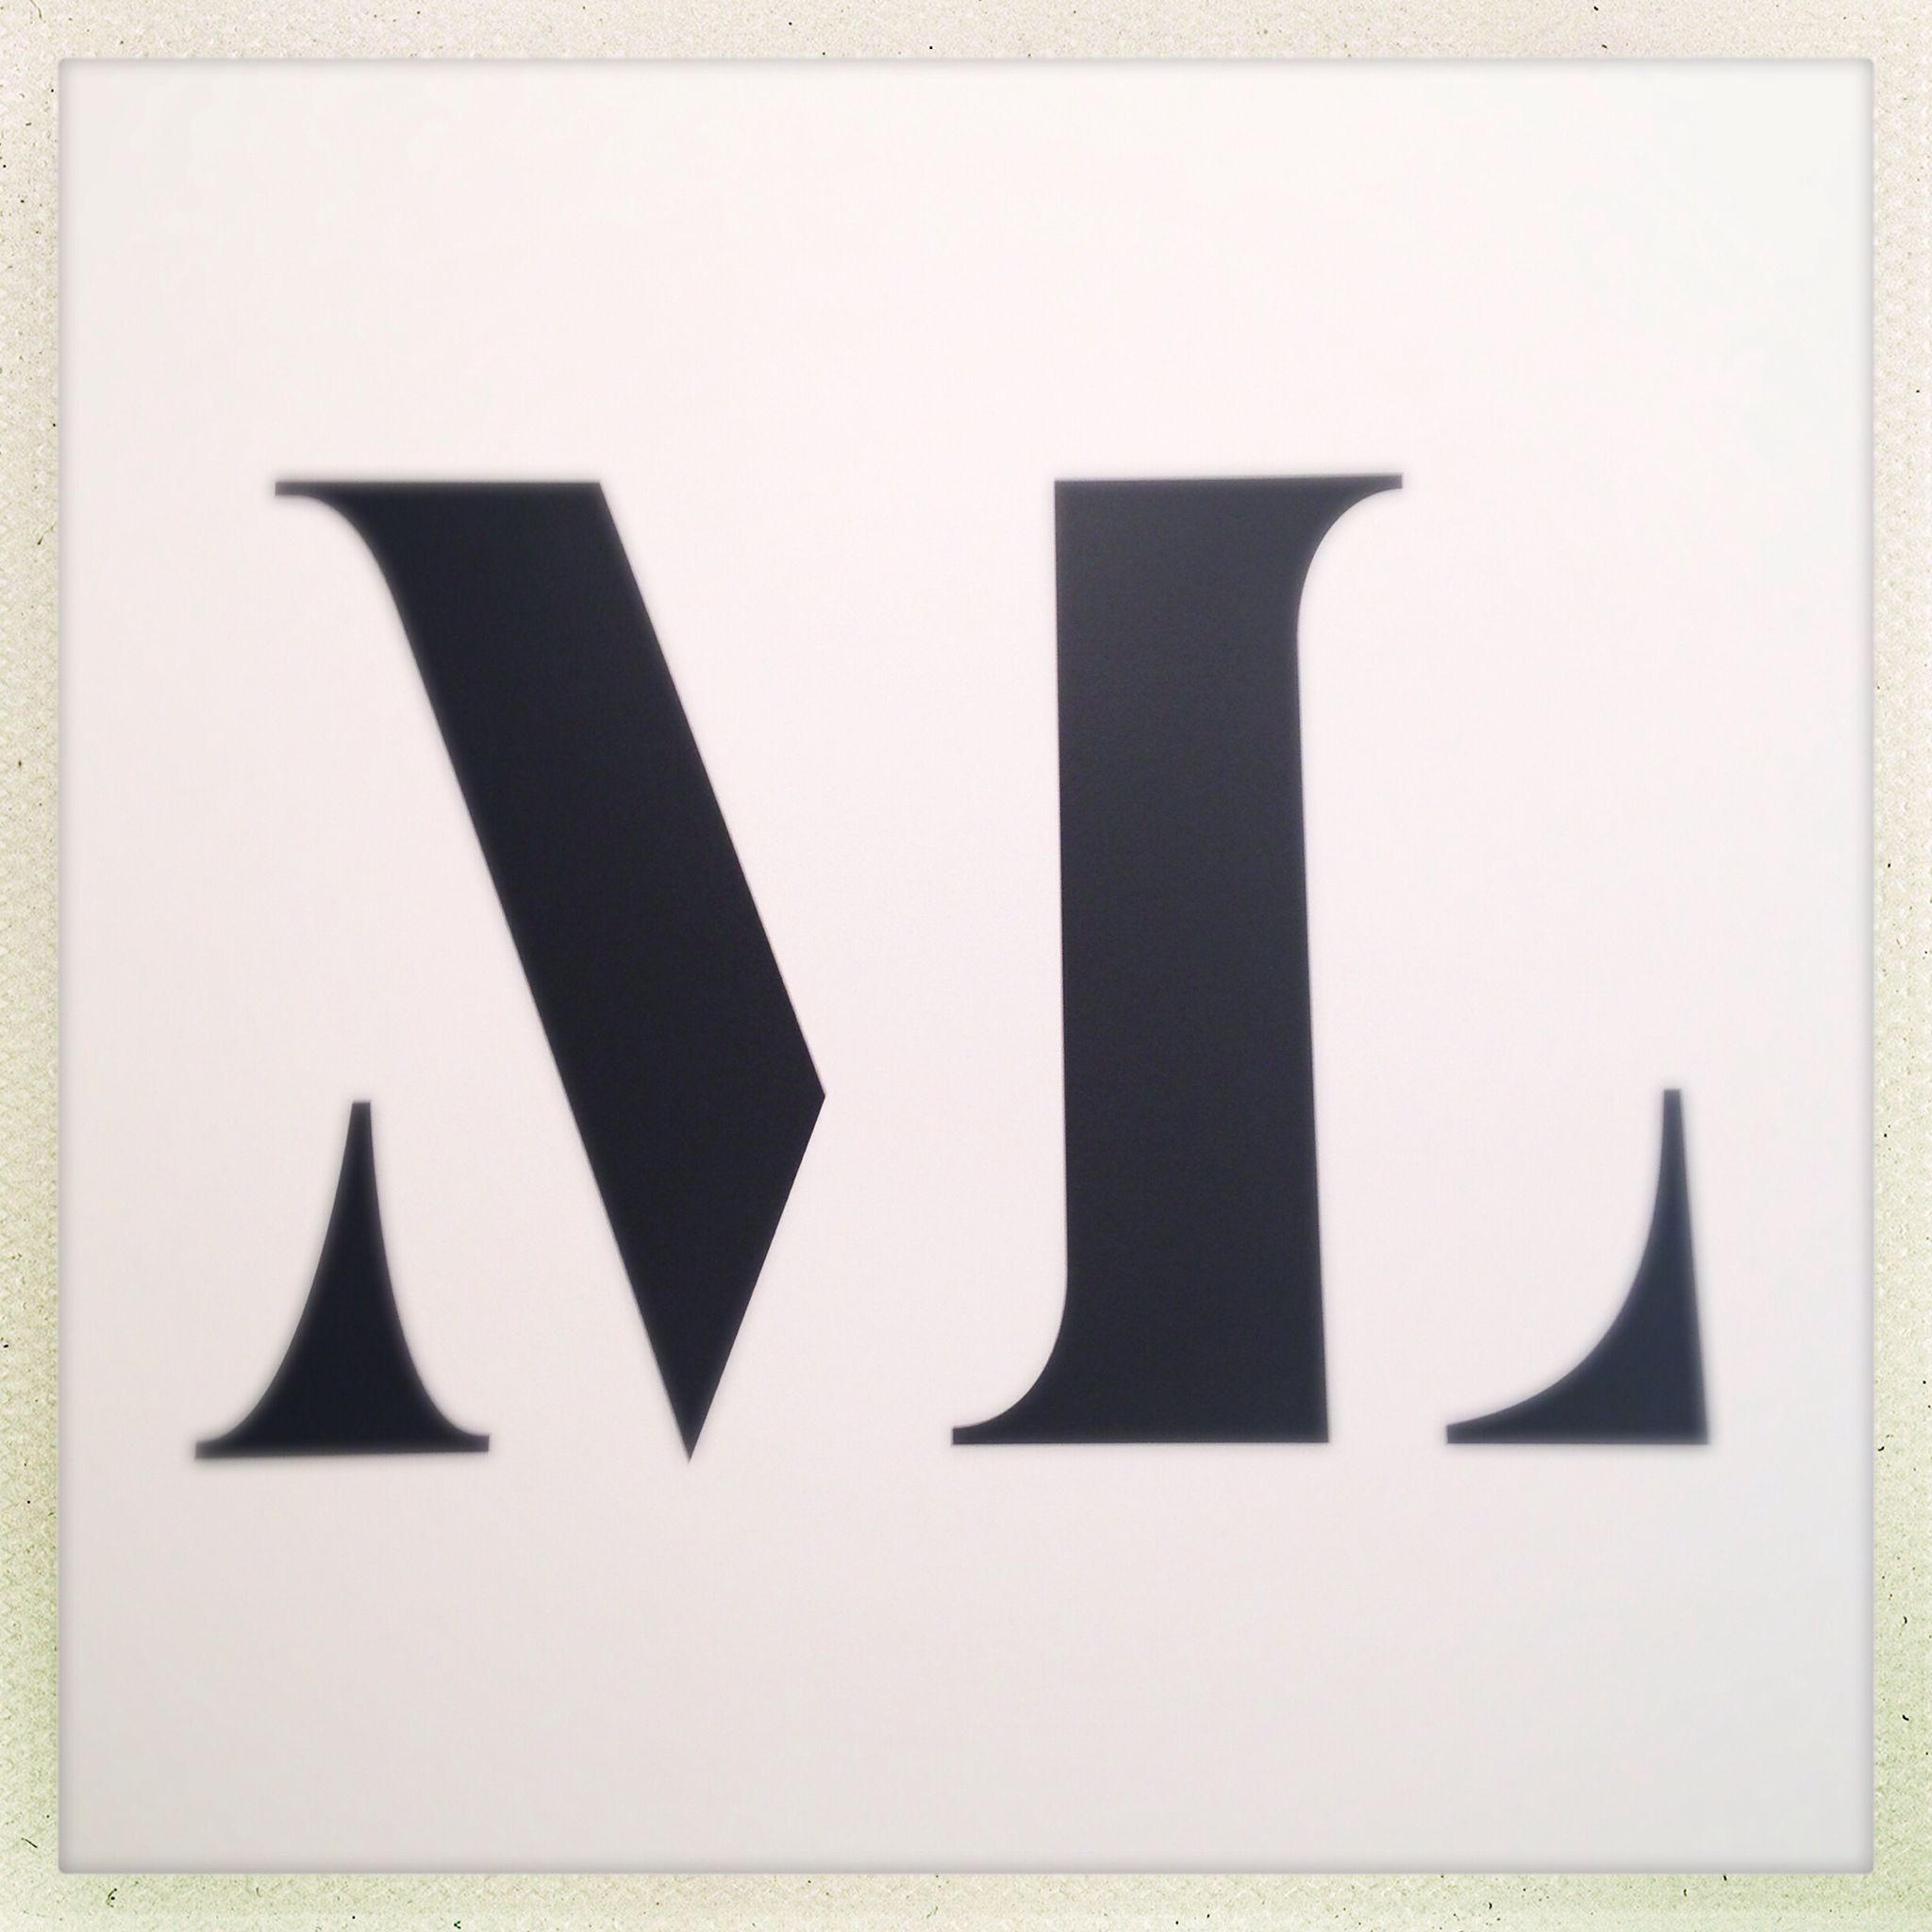 Le logo de la Maison Losseau